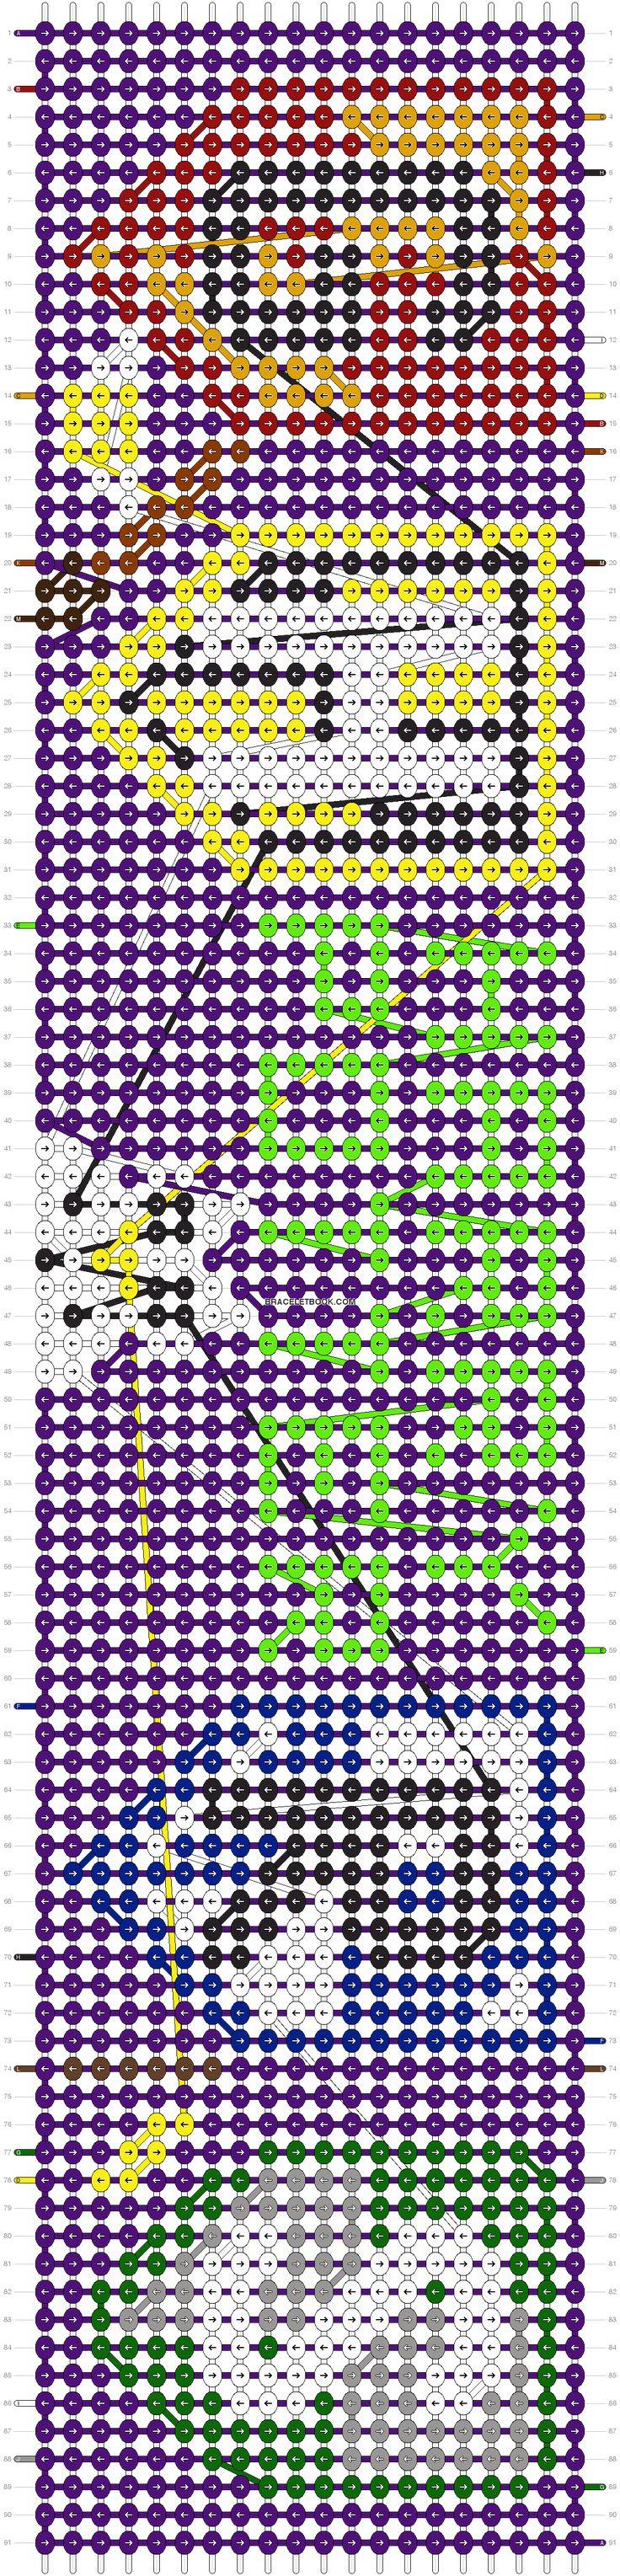 Dorable Leicht Häkelarbeitbaby Afghanisch Muster Frei Frieze - Decke ...